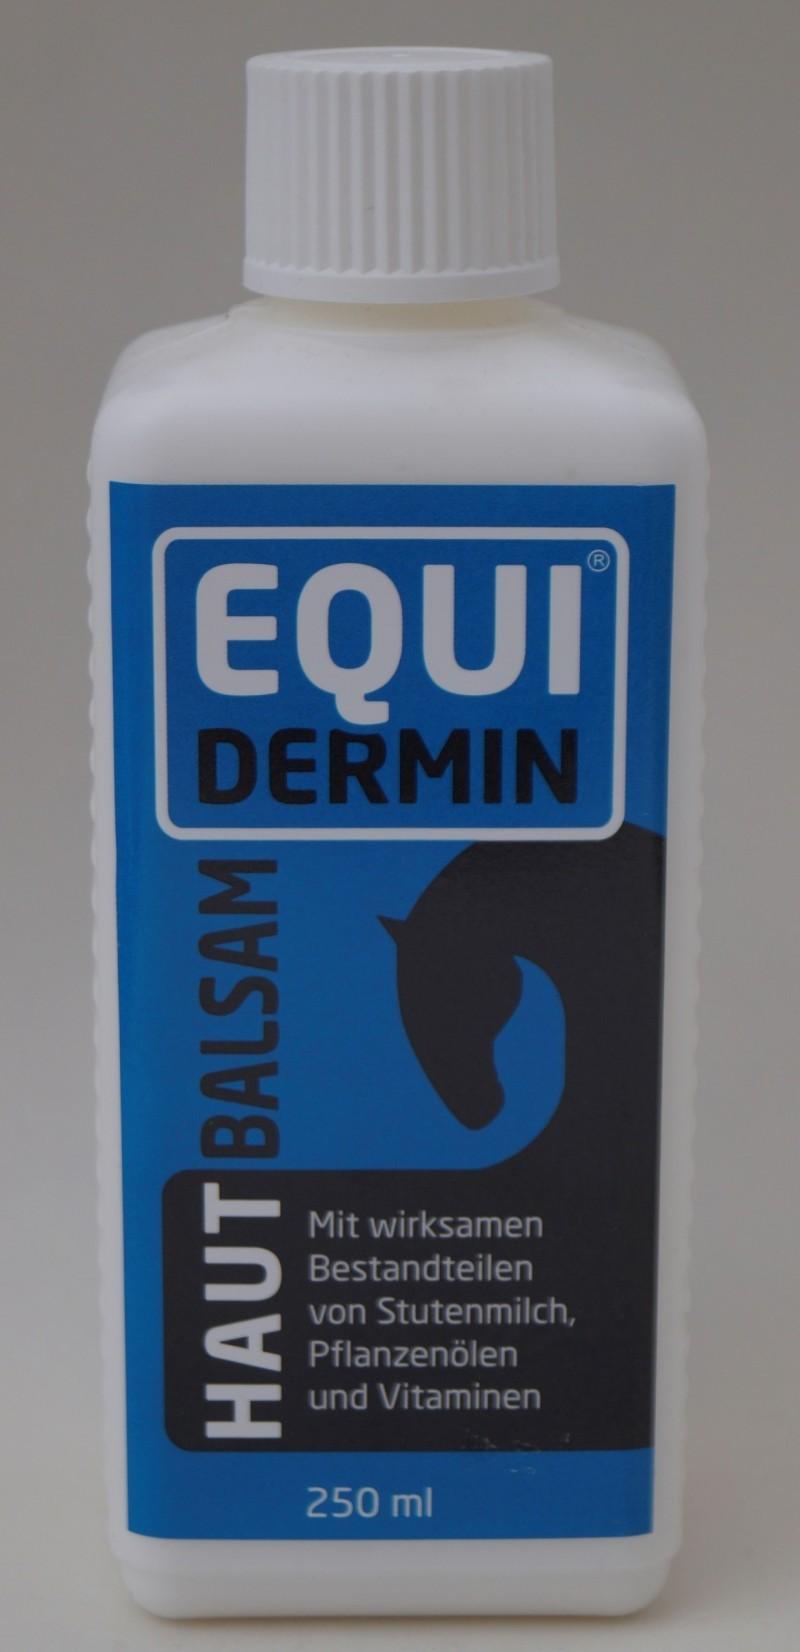 EQUI DERMIN Hautbalsam 2